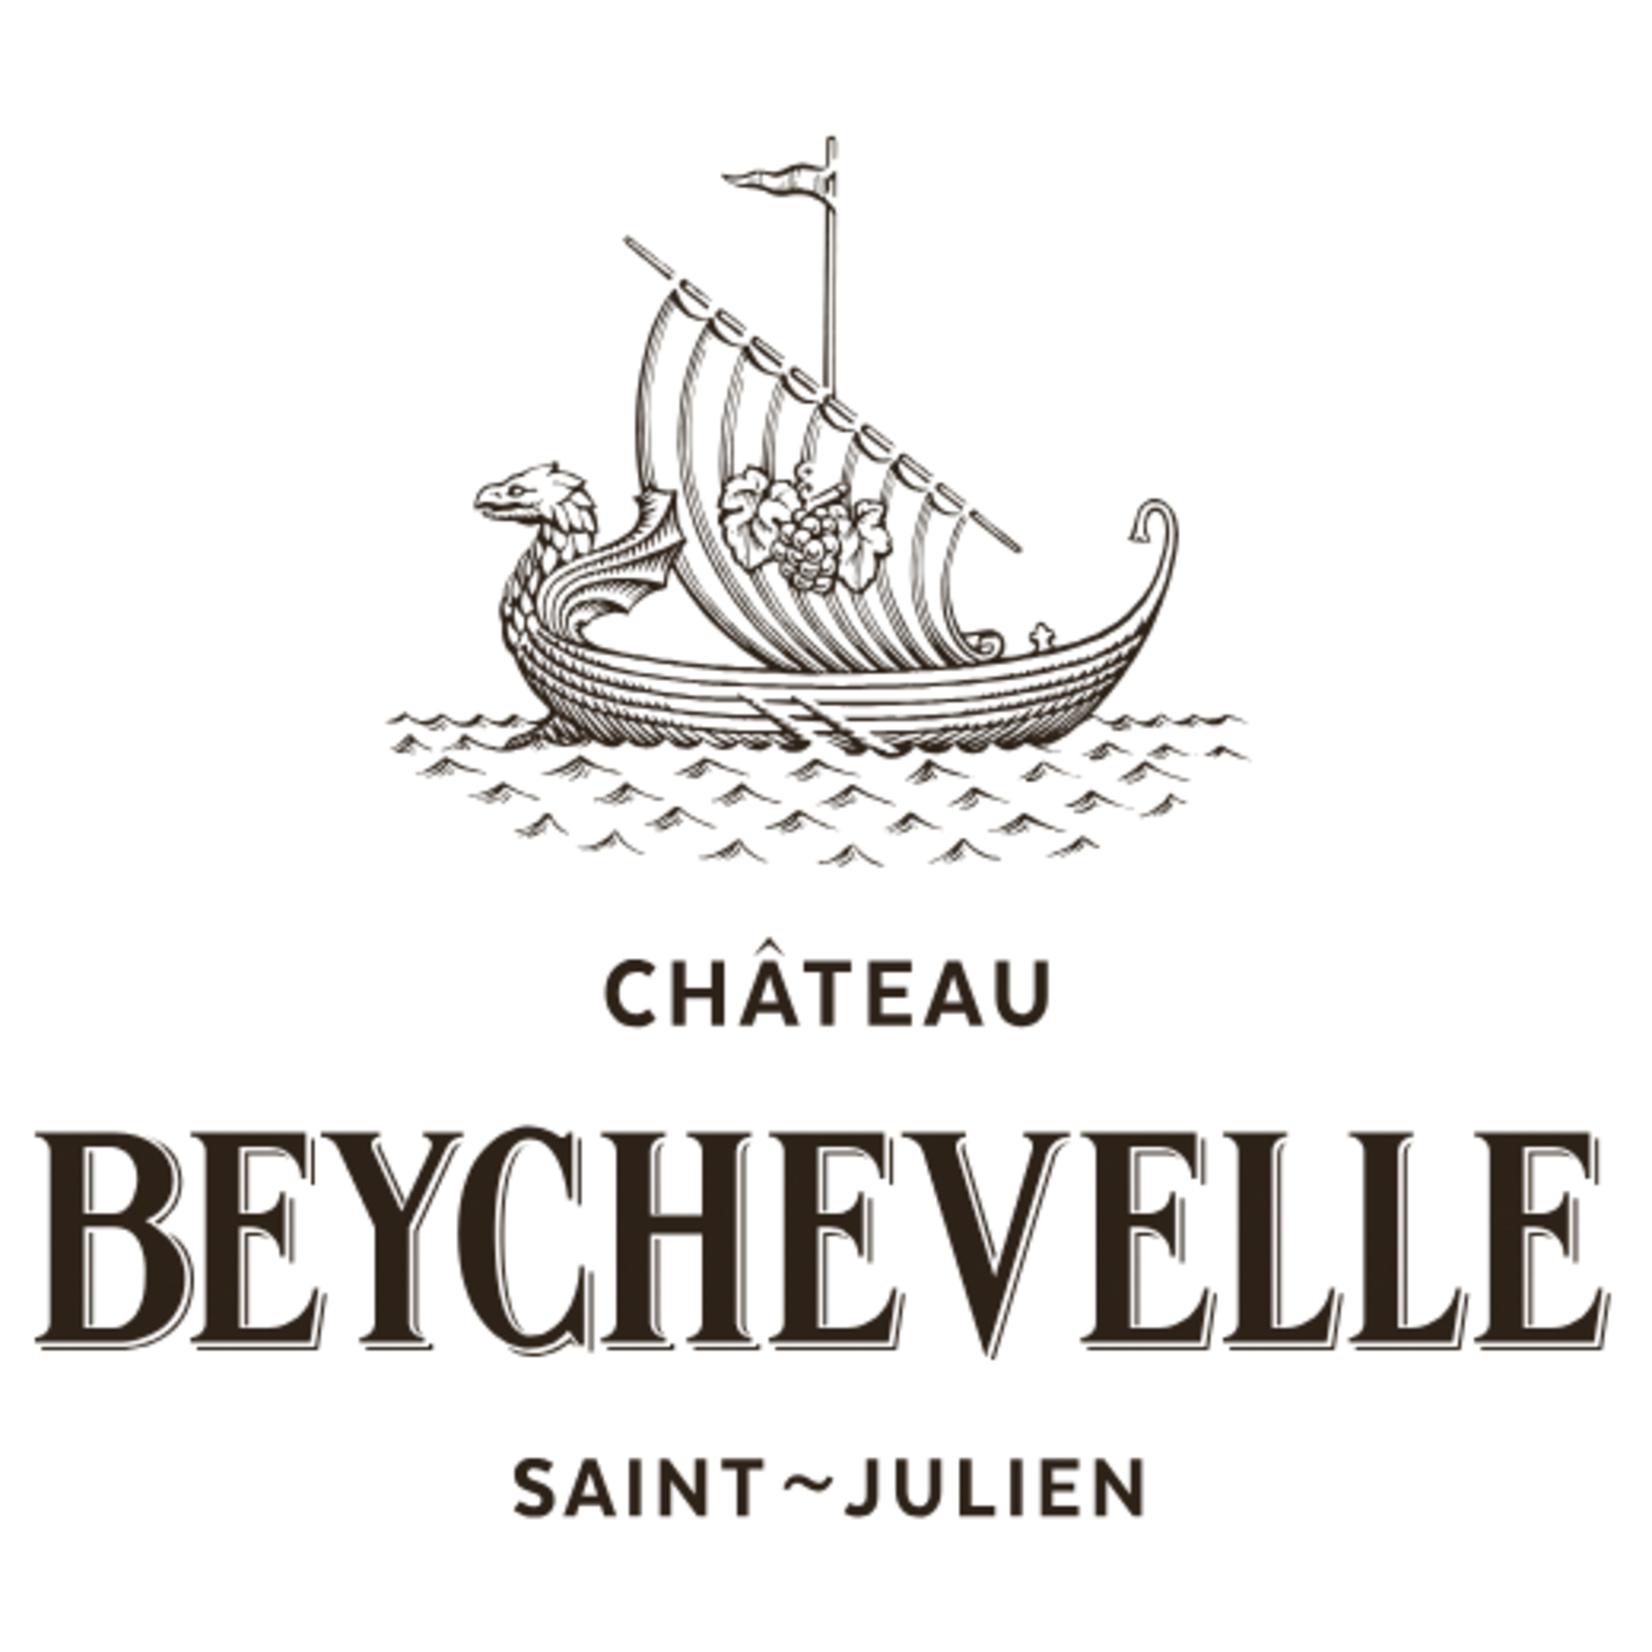 Wine Chateau Beychevelle 2009